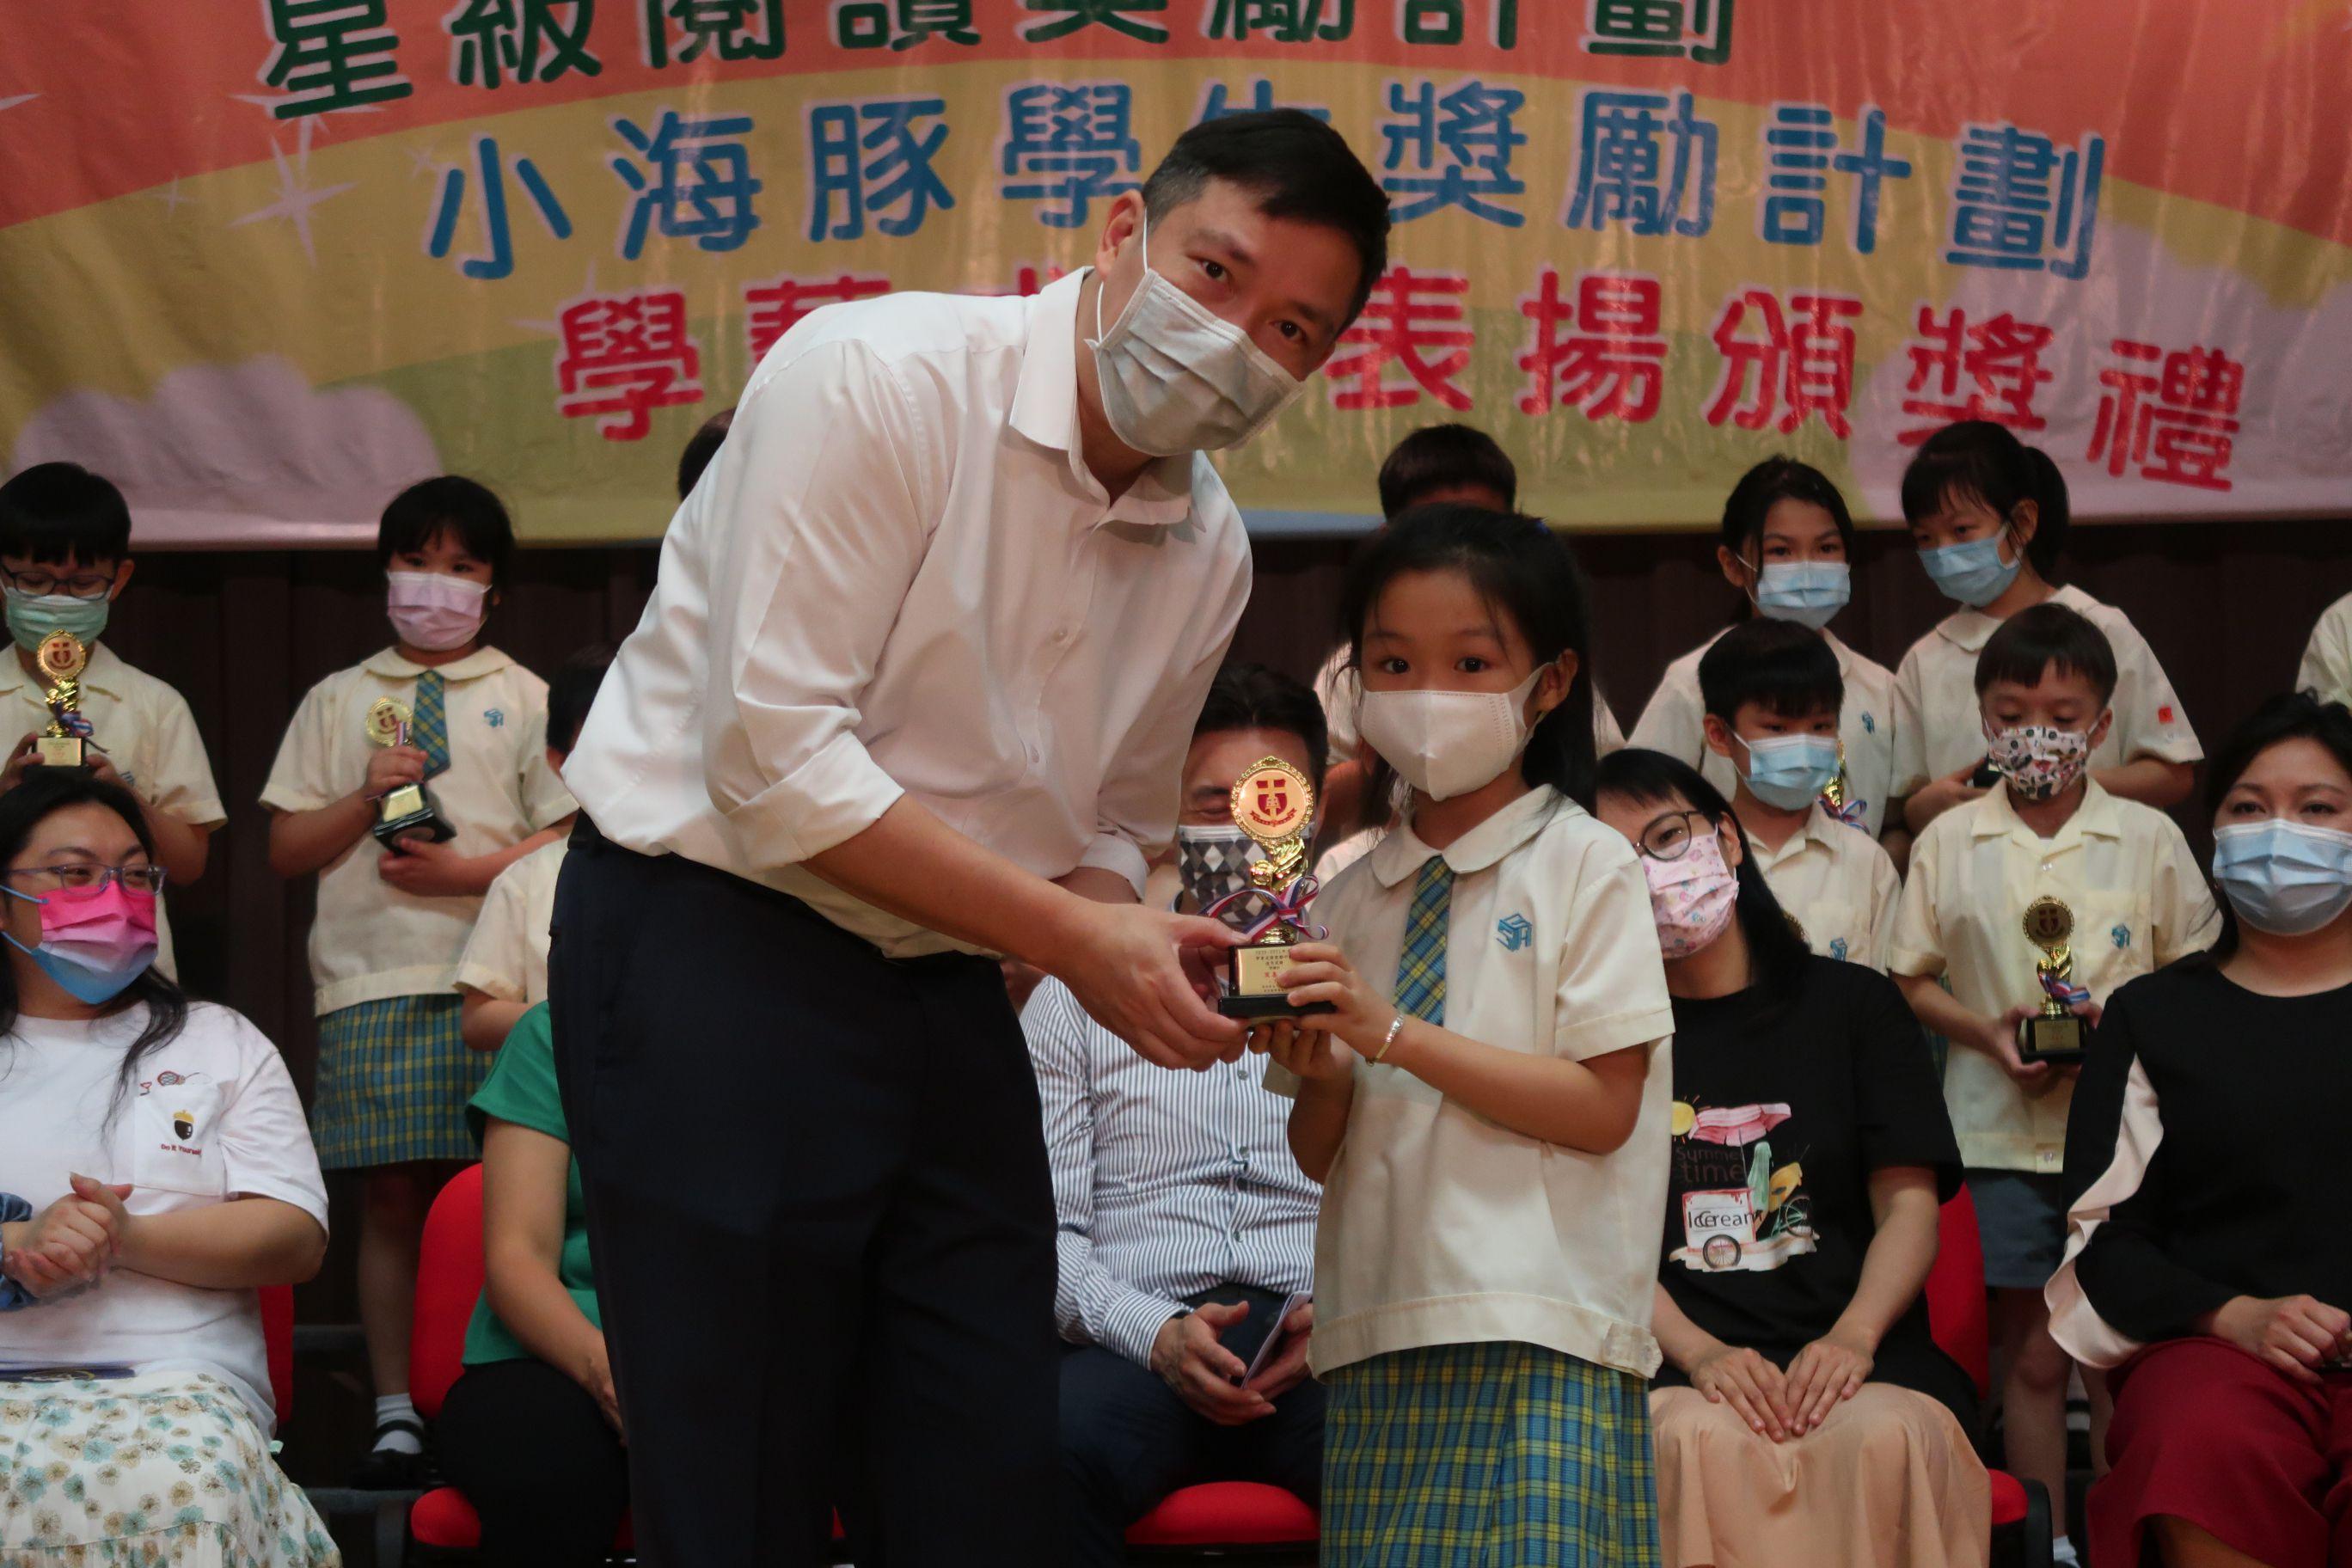 https://syh.edu.hk/sites/default/files/img_5673.jpg